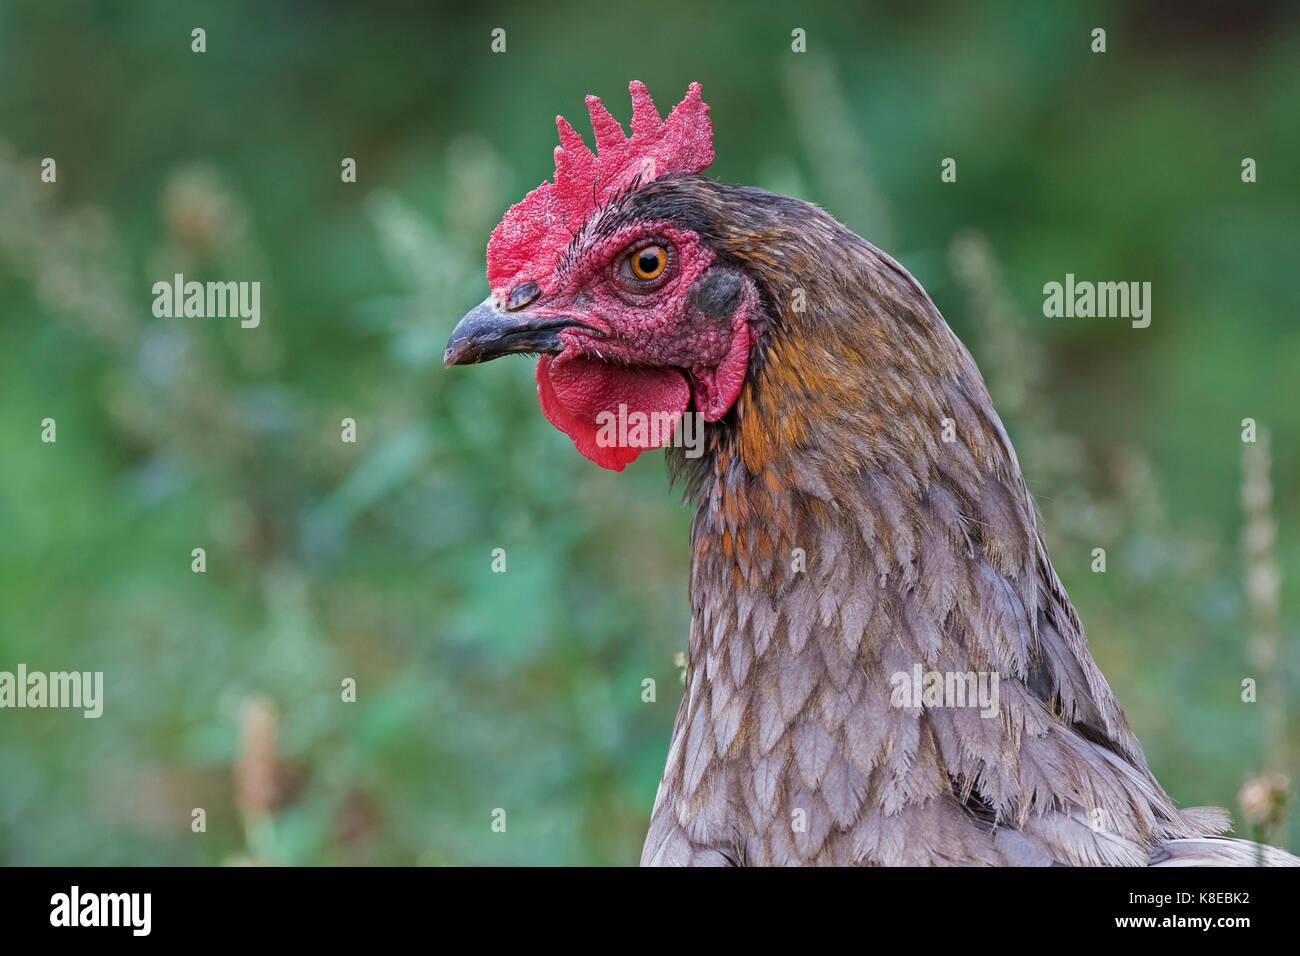 Domestic chicken, portrait, hen breed Marans - Stock Image